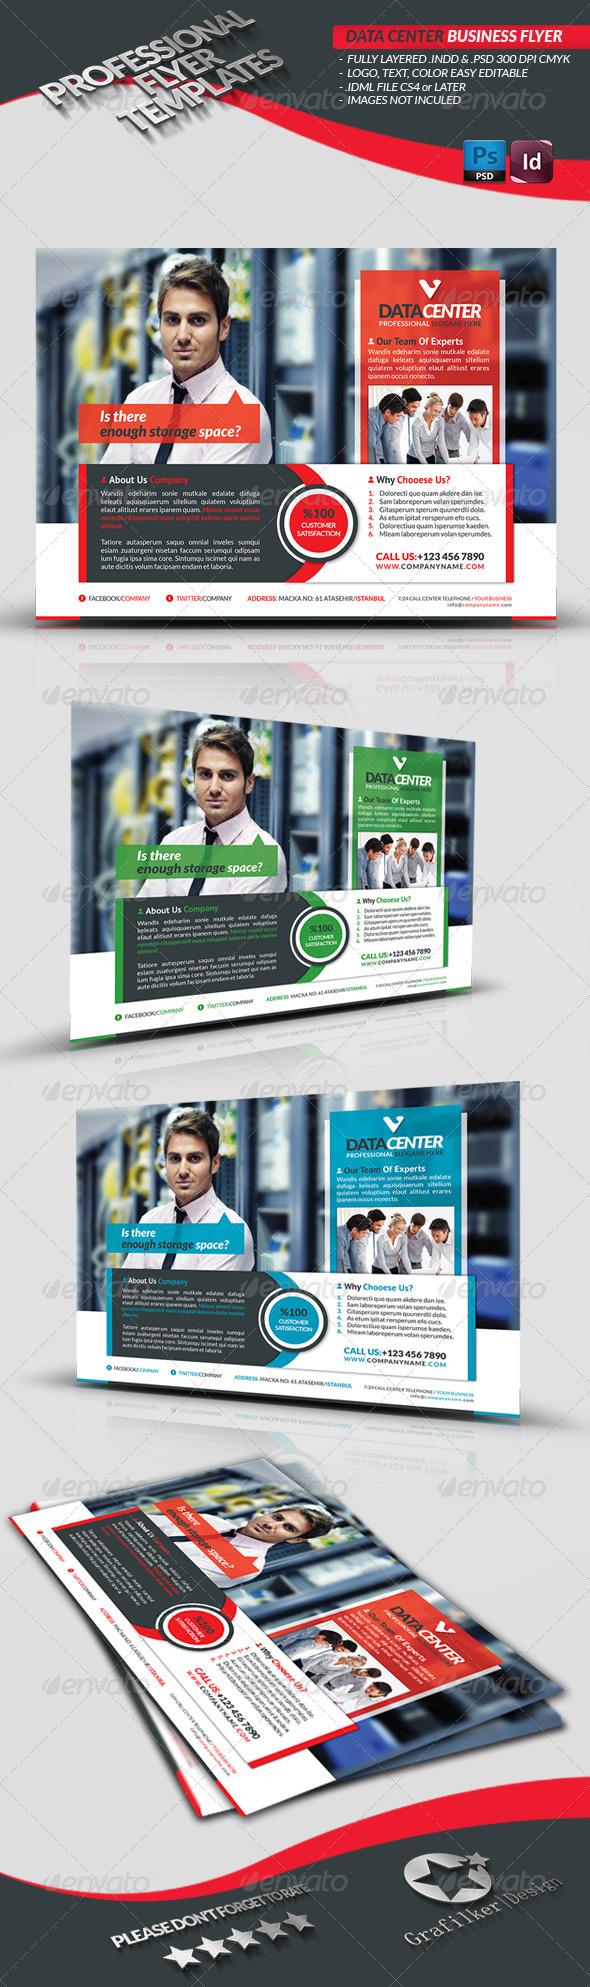 GraphicRiver Data Center Business Flyer 3666904